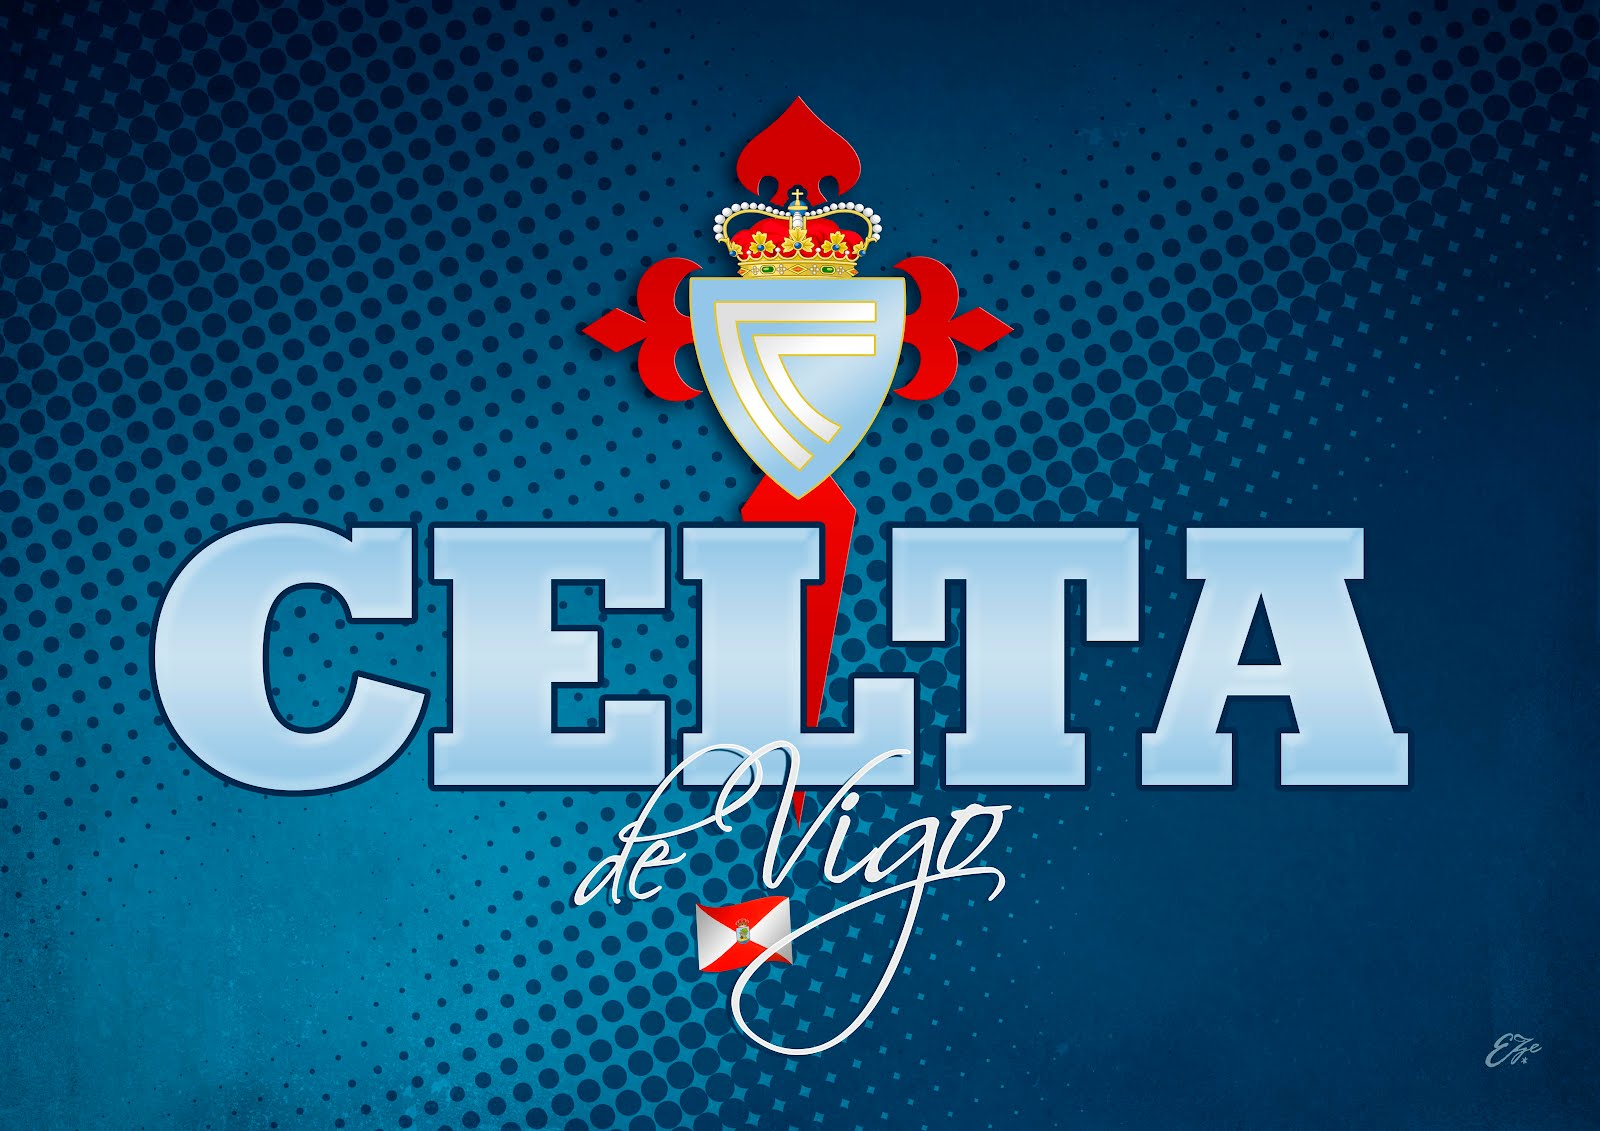 Celta de Vigo Wallpaper 3   1600 X 1131 stmednet 1600x1131